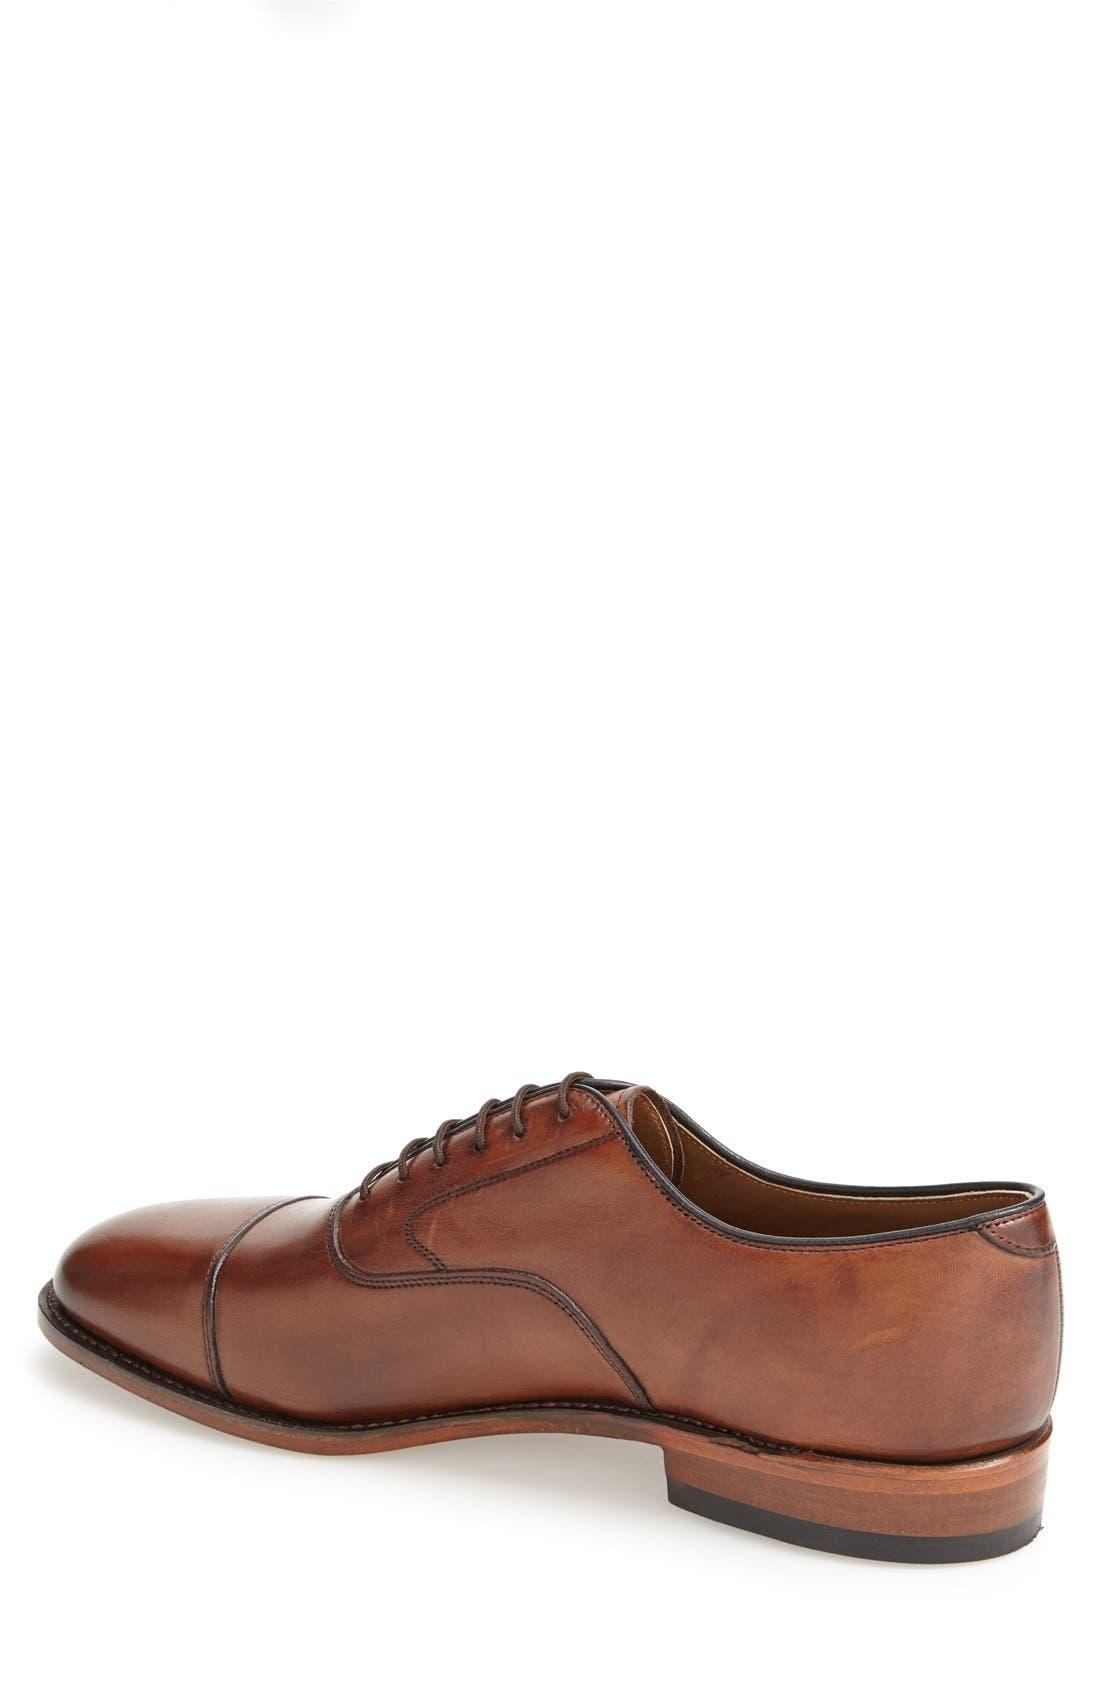 1b2abb548bc62 Men's Cap Toe Oxfords & Derby Shoes | Nordstrom